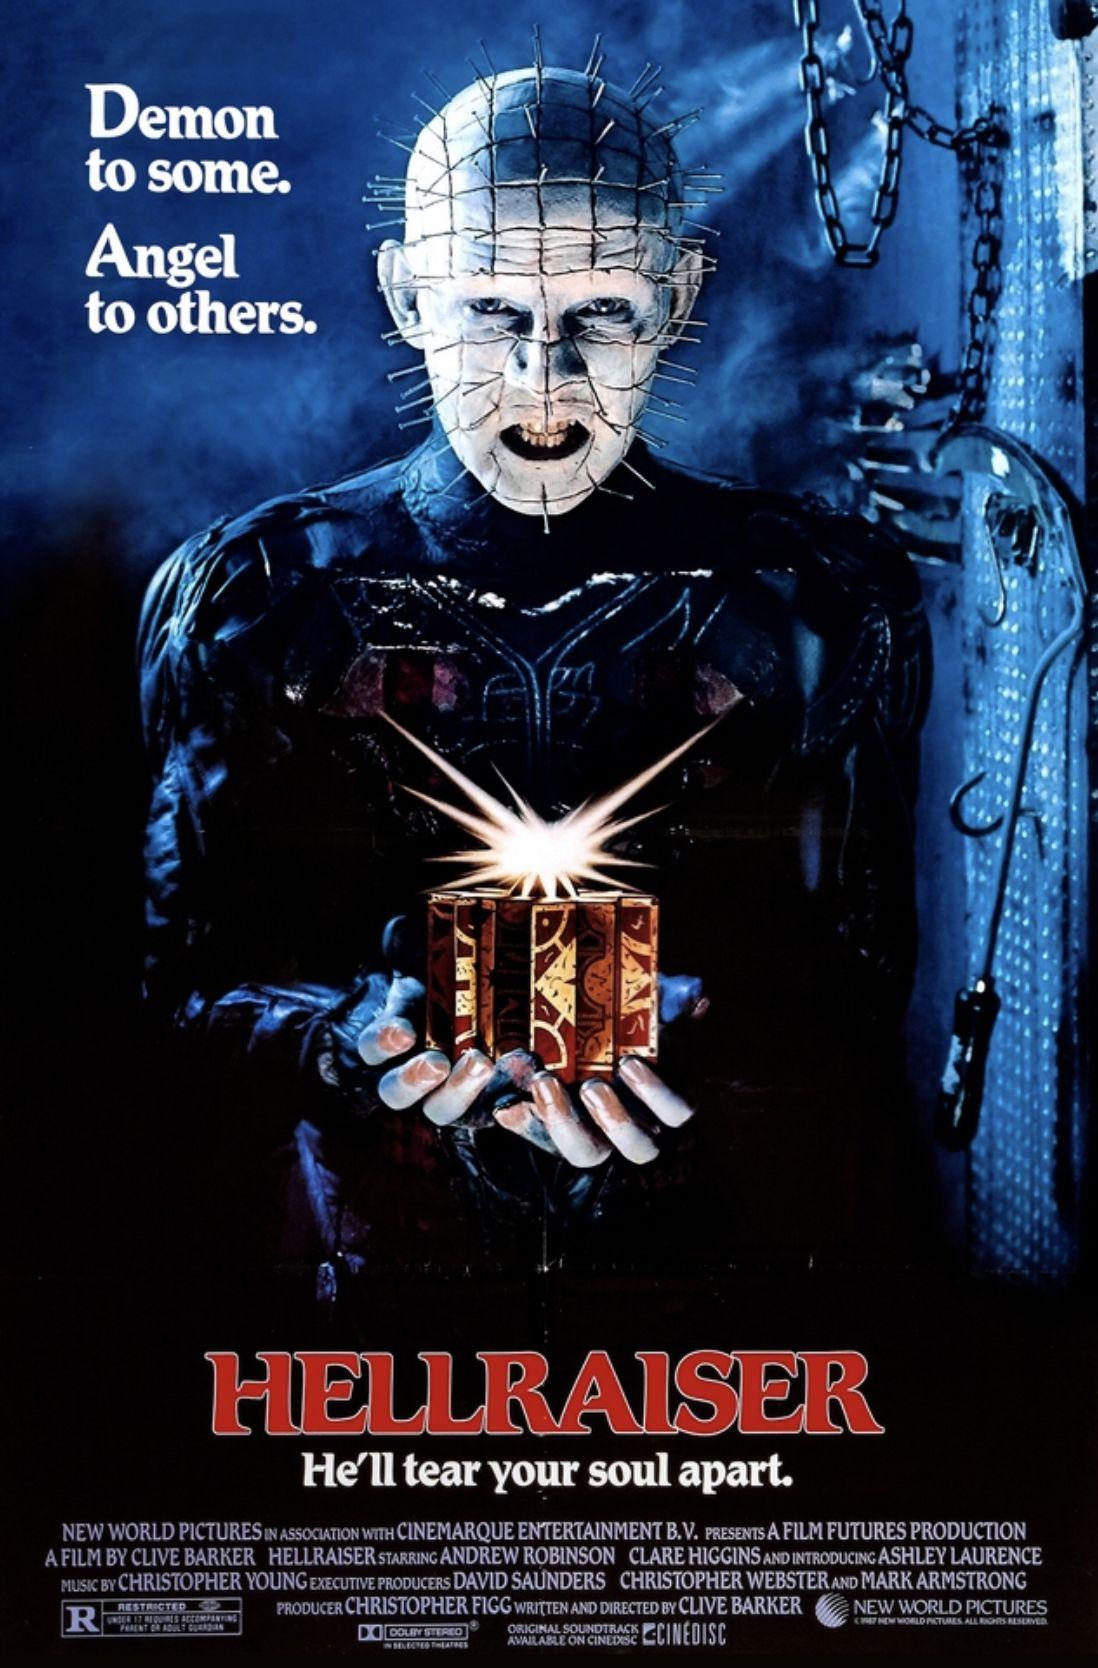 Movie poster Hellraiser, Horror movies on netflix, Free